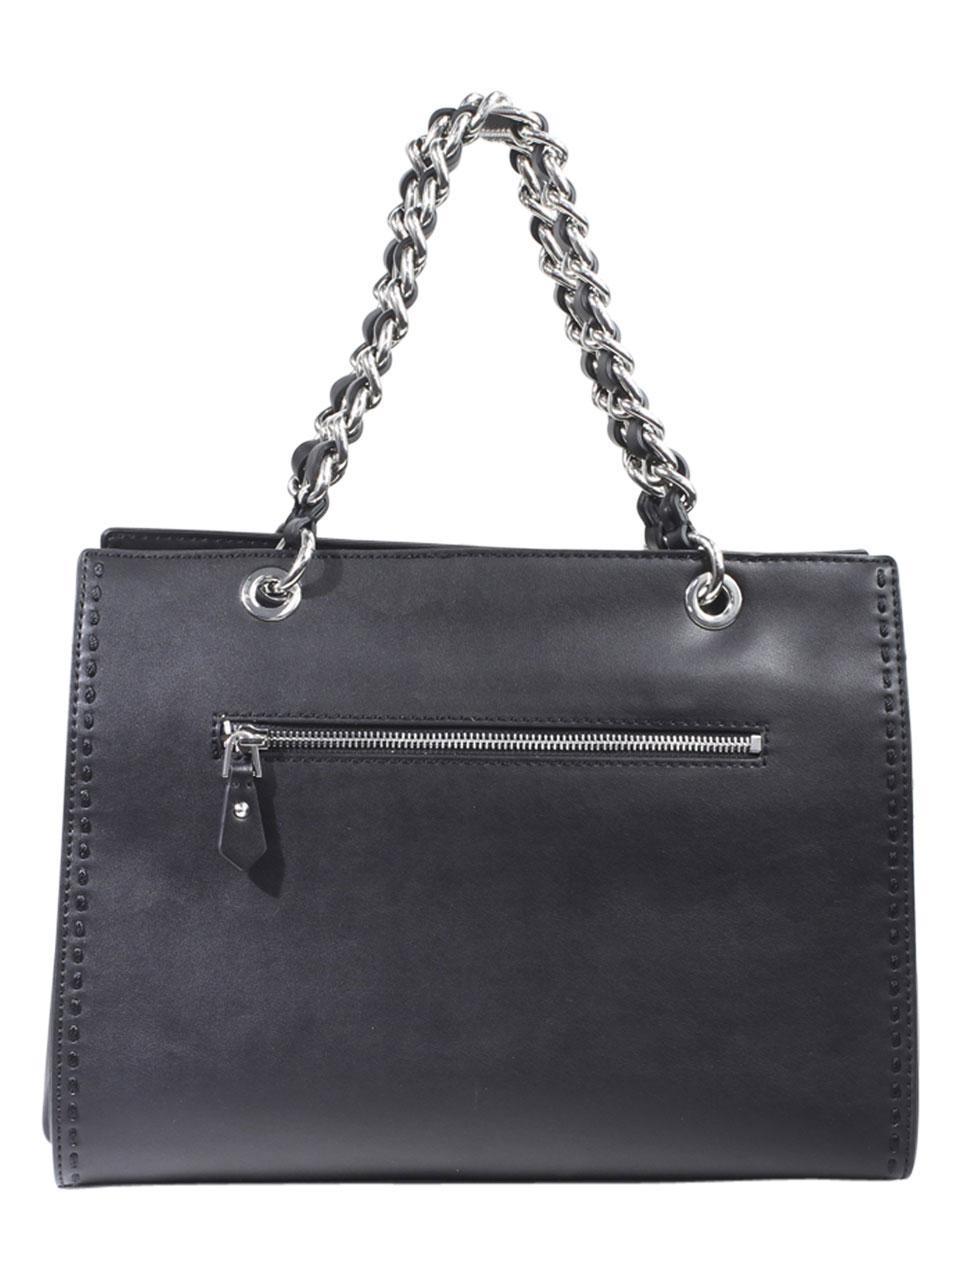 Guess-Women-039-s-Sawyer-Satchel-Handbag thumbnail 10